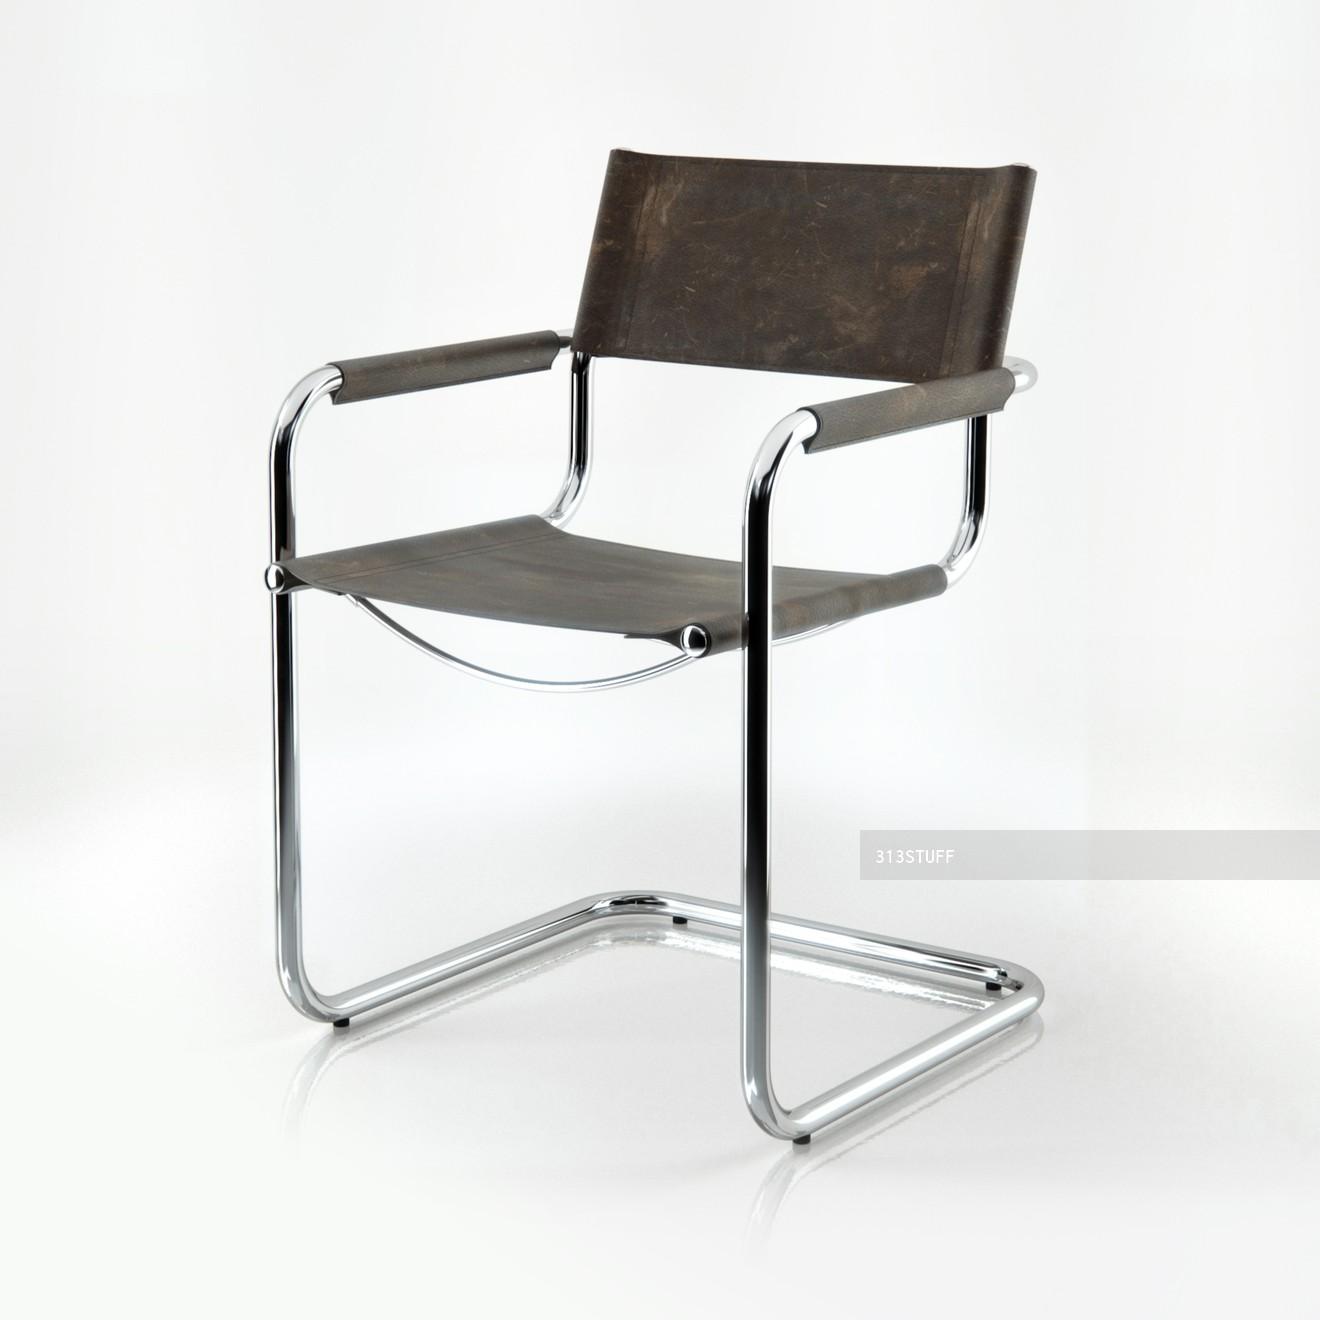 matteograssi freischwinger mg5 armchair. Black Bedroom Furniture Sets. Home Design Ideas